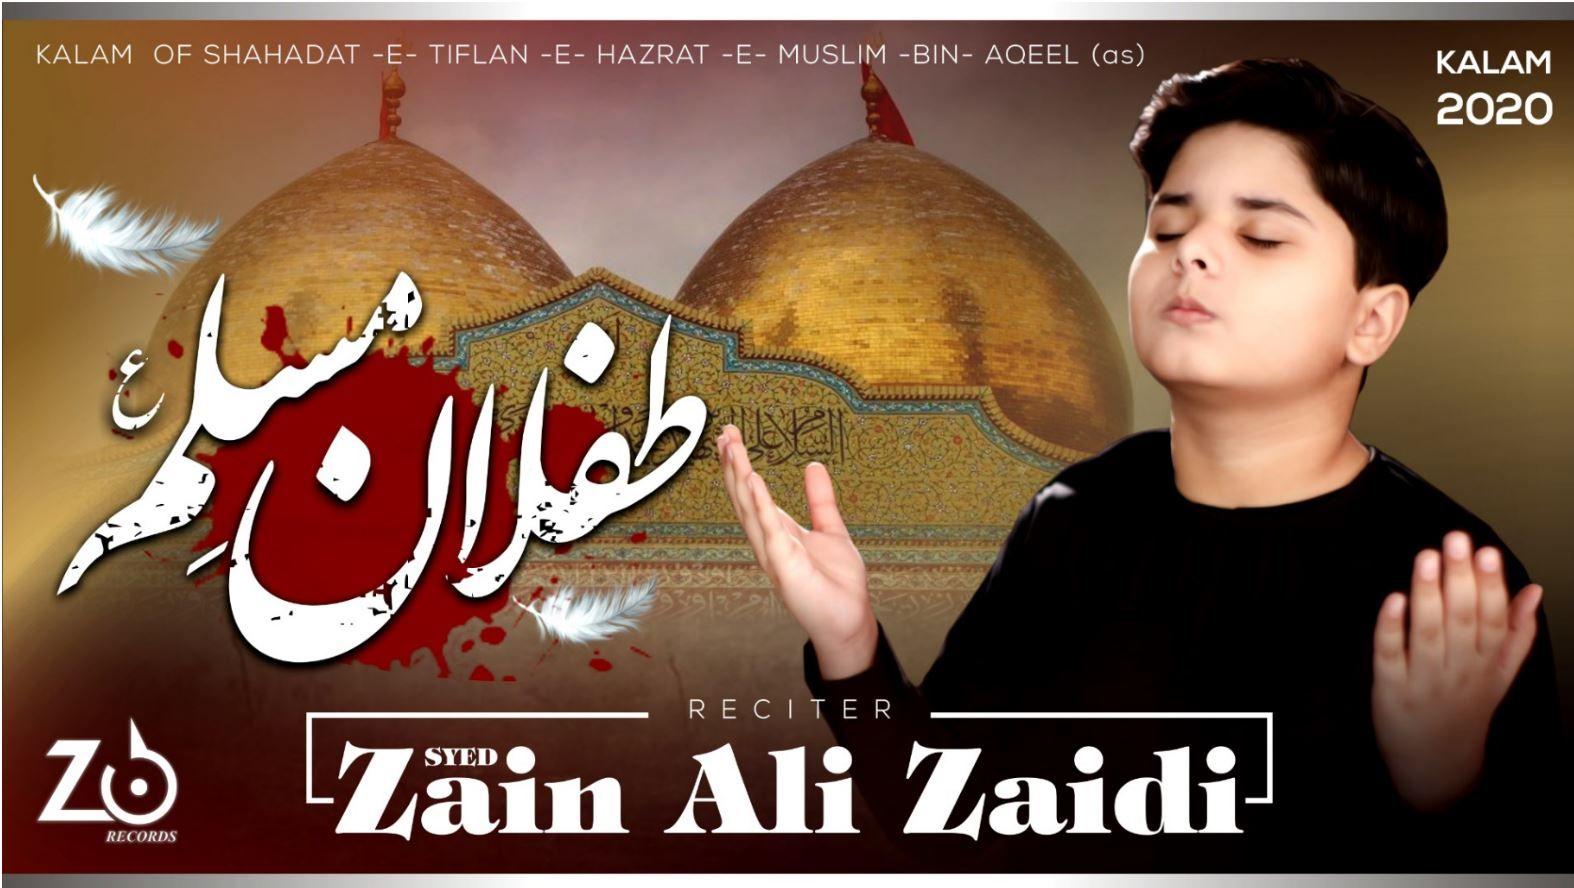 Muharrum Noha 1442 / 2020 | Tiflan E Muslim A.S | Zain Ali Zaidi | Shahadat Muslim Bin Aqeel A.S